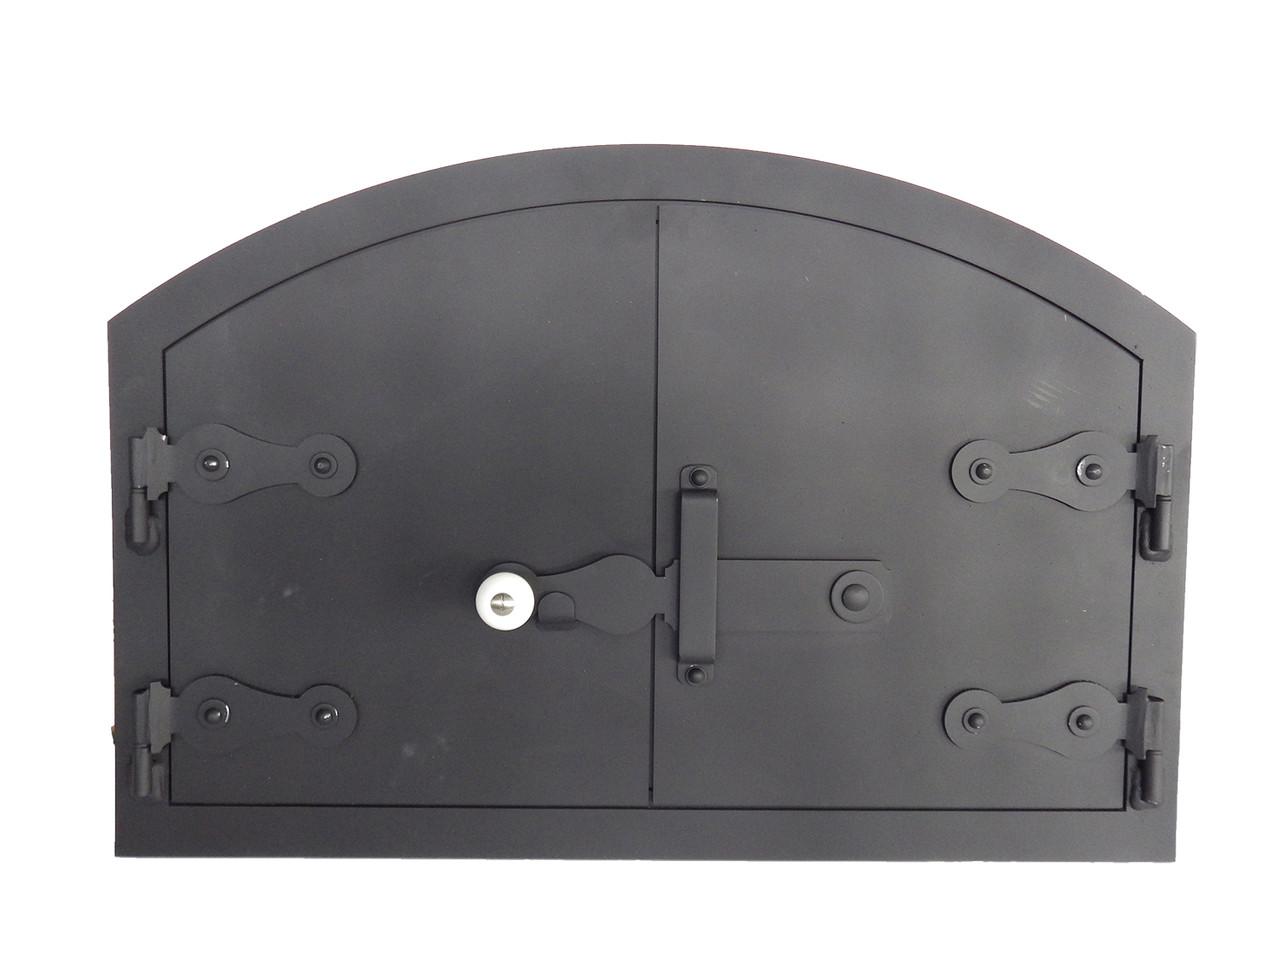 Дверки для хлебной печи (60 х 40)см (53 х 33 см) - Ваш Комин в Ужгороде